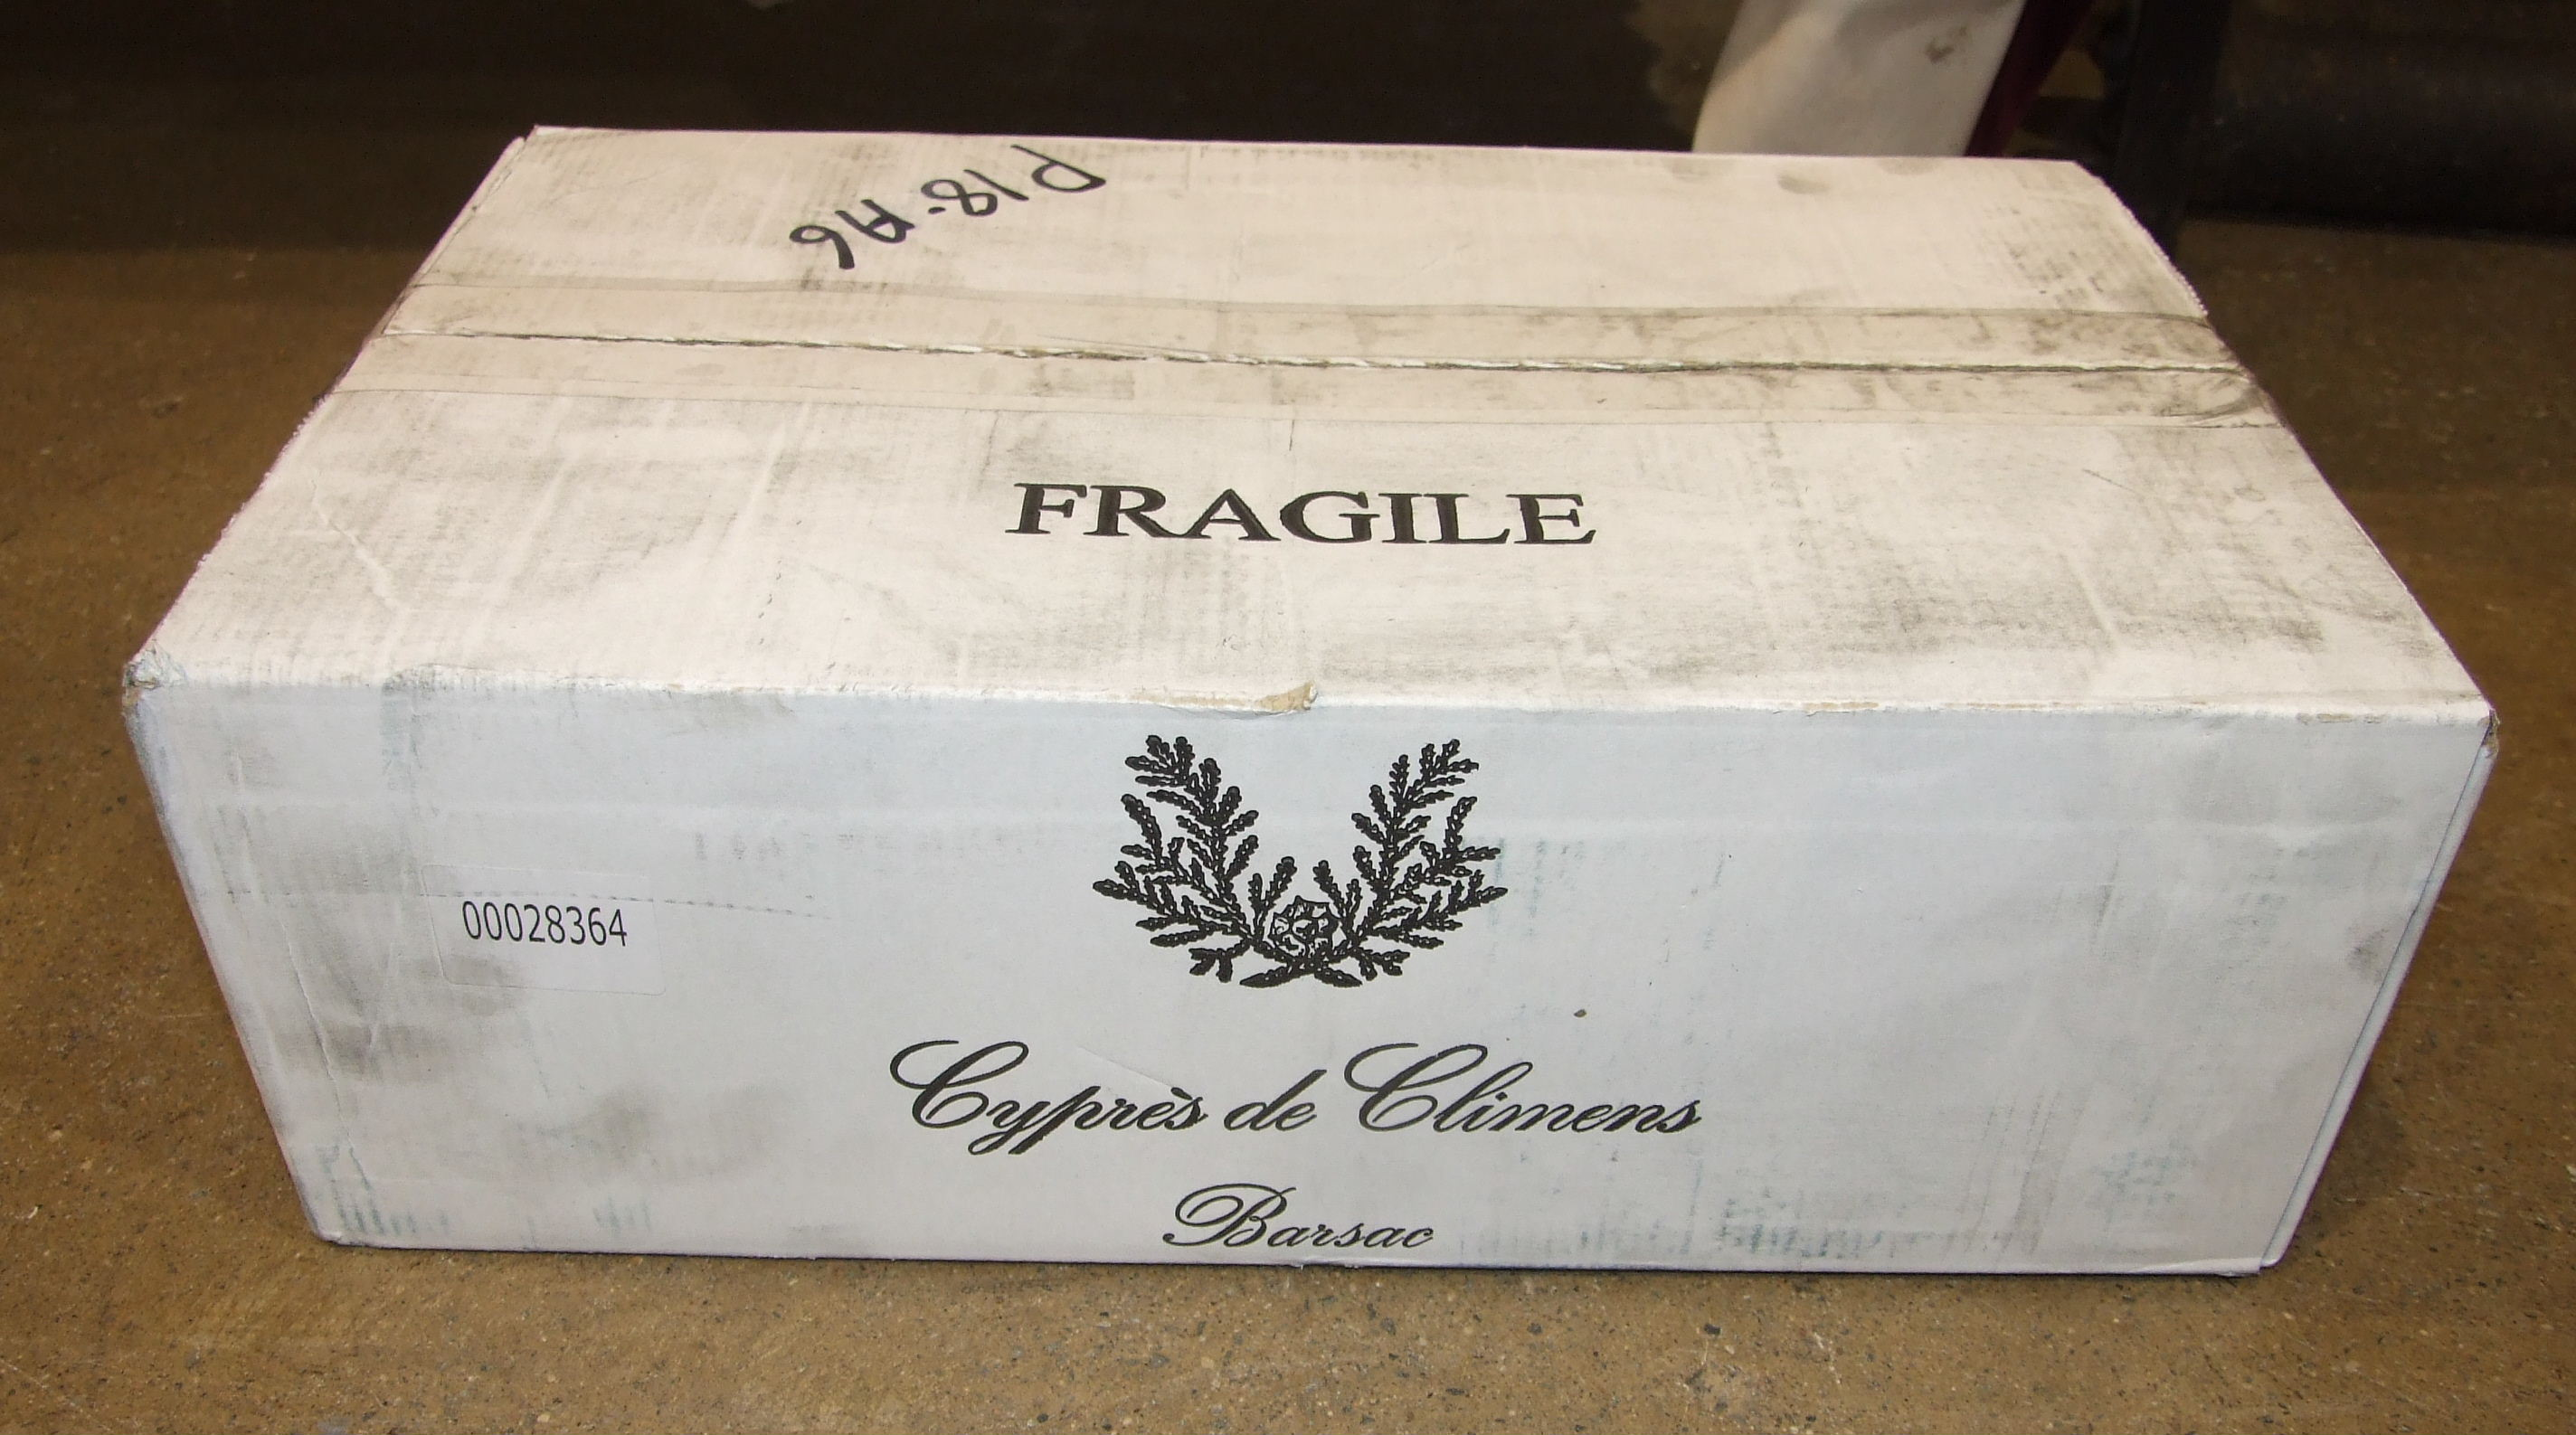 Lot 30 - Cyprès de Climens Barsac, 375ml, twelve bottles in cardboard carton, (12).